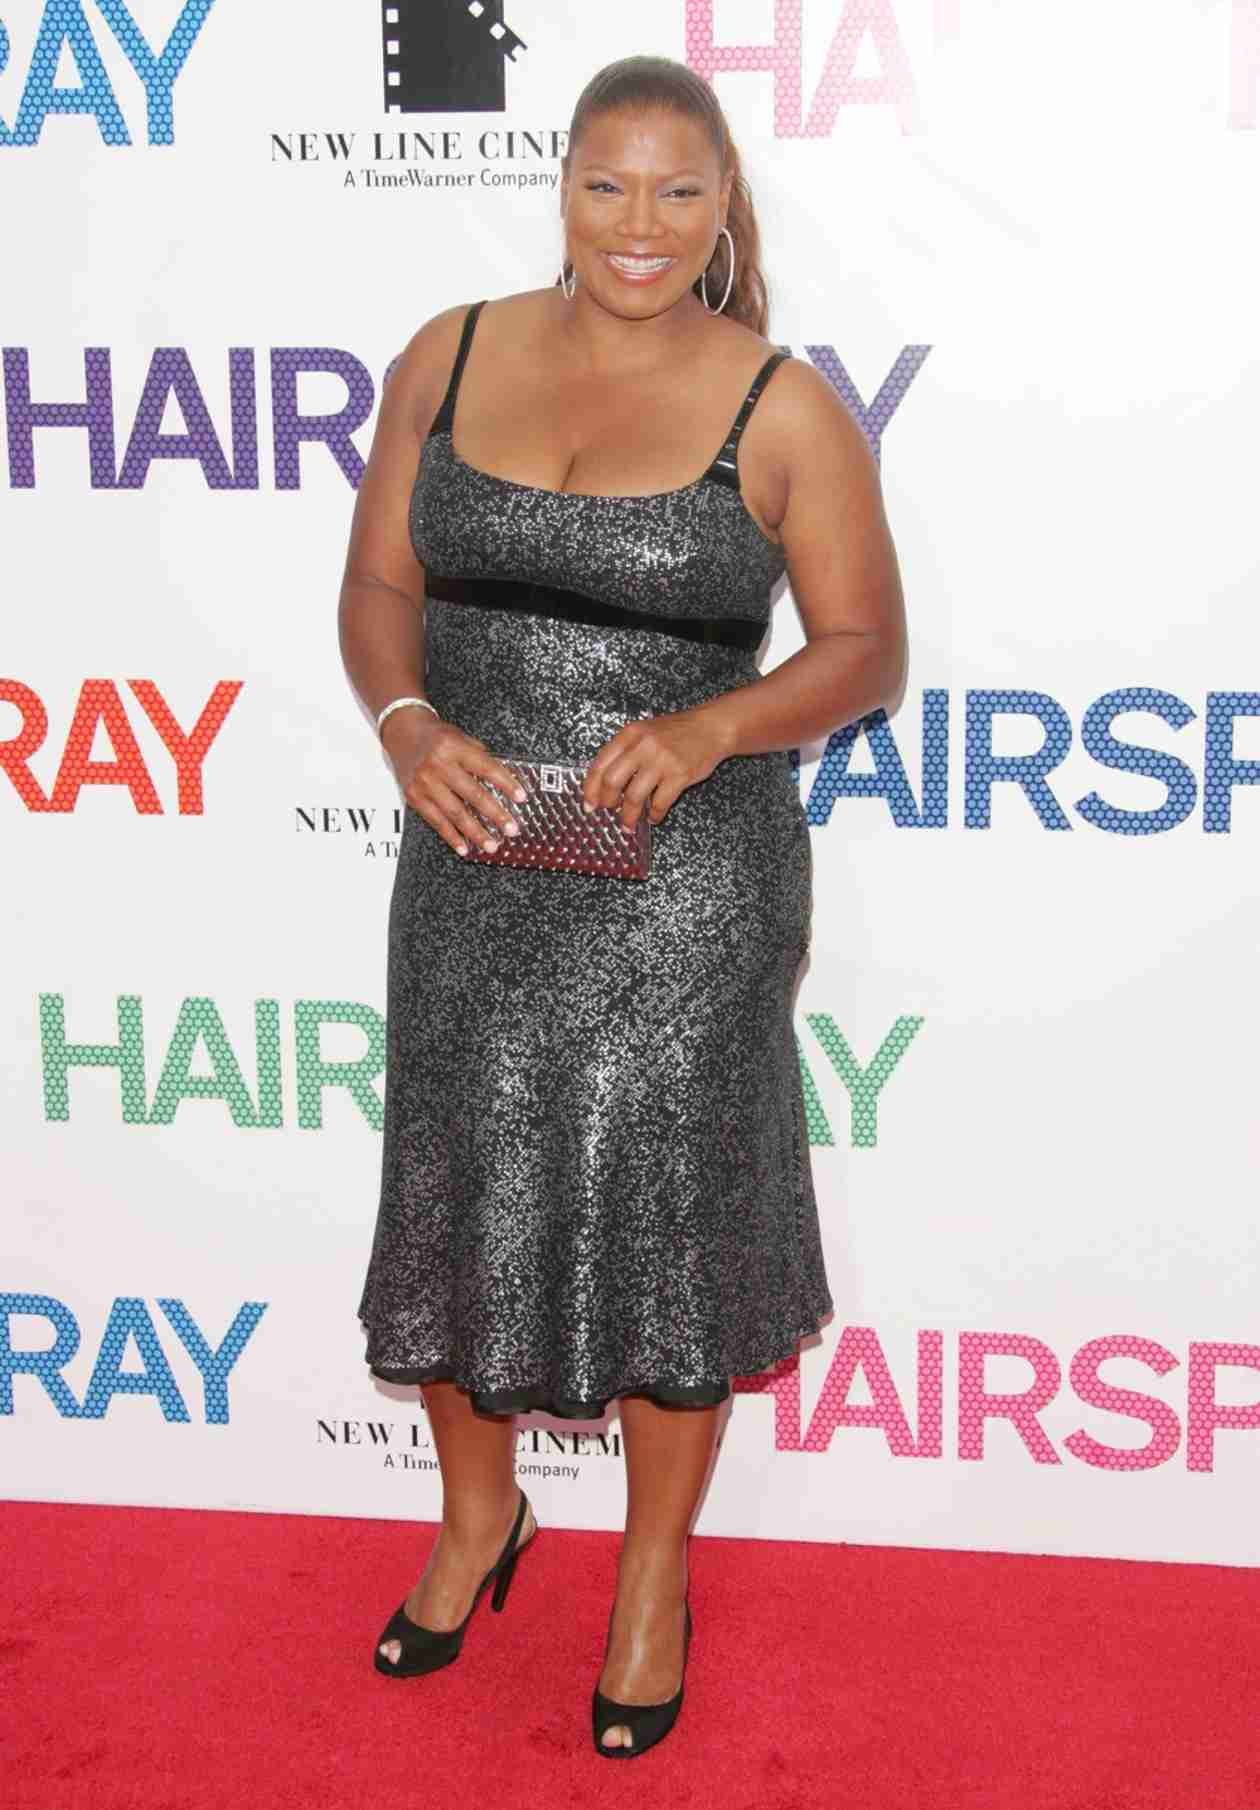 Queen latifah weight loss jenny craig